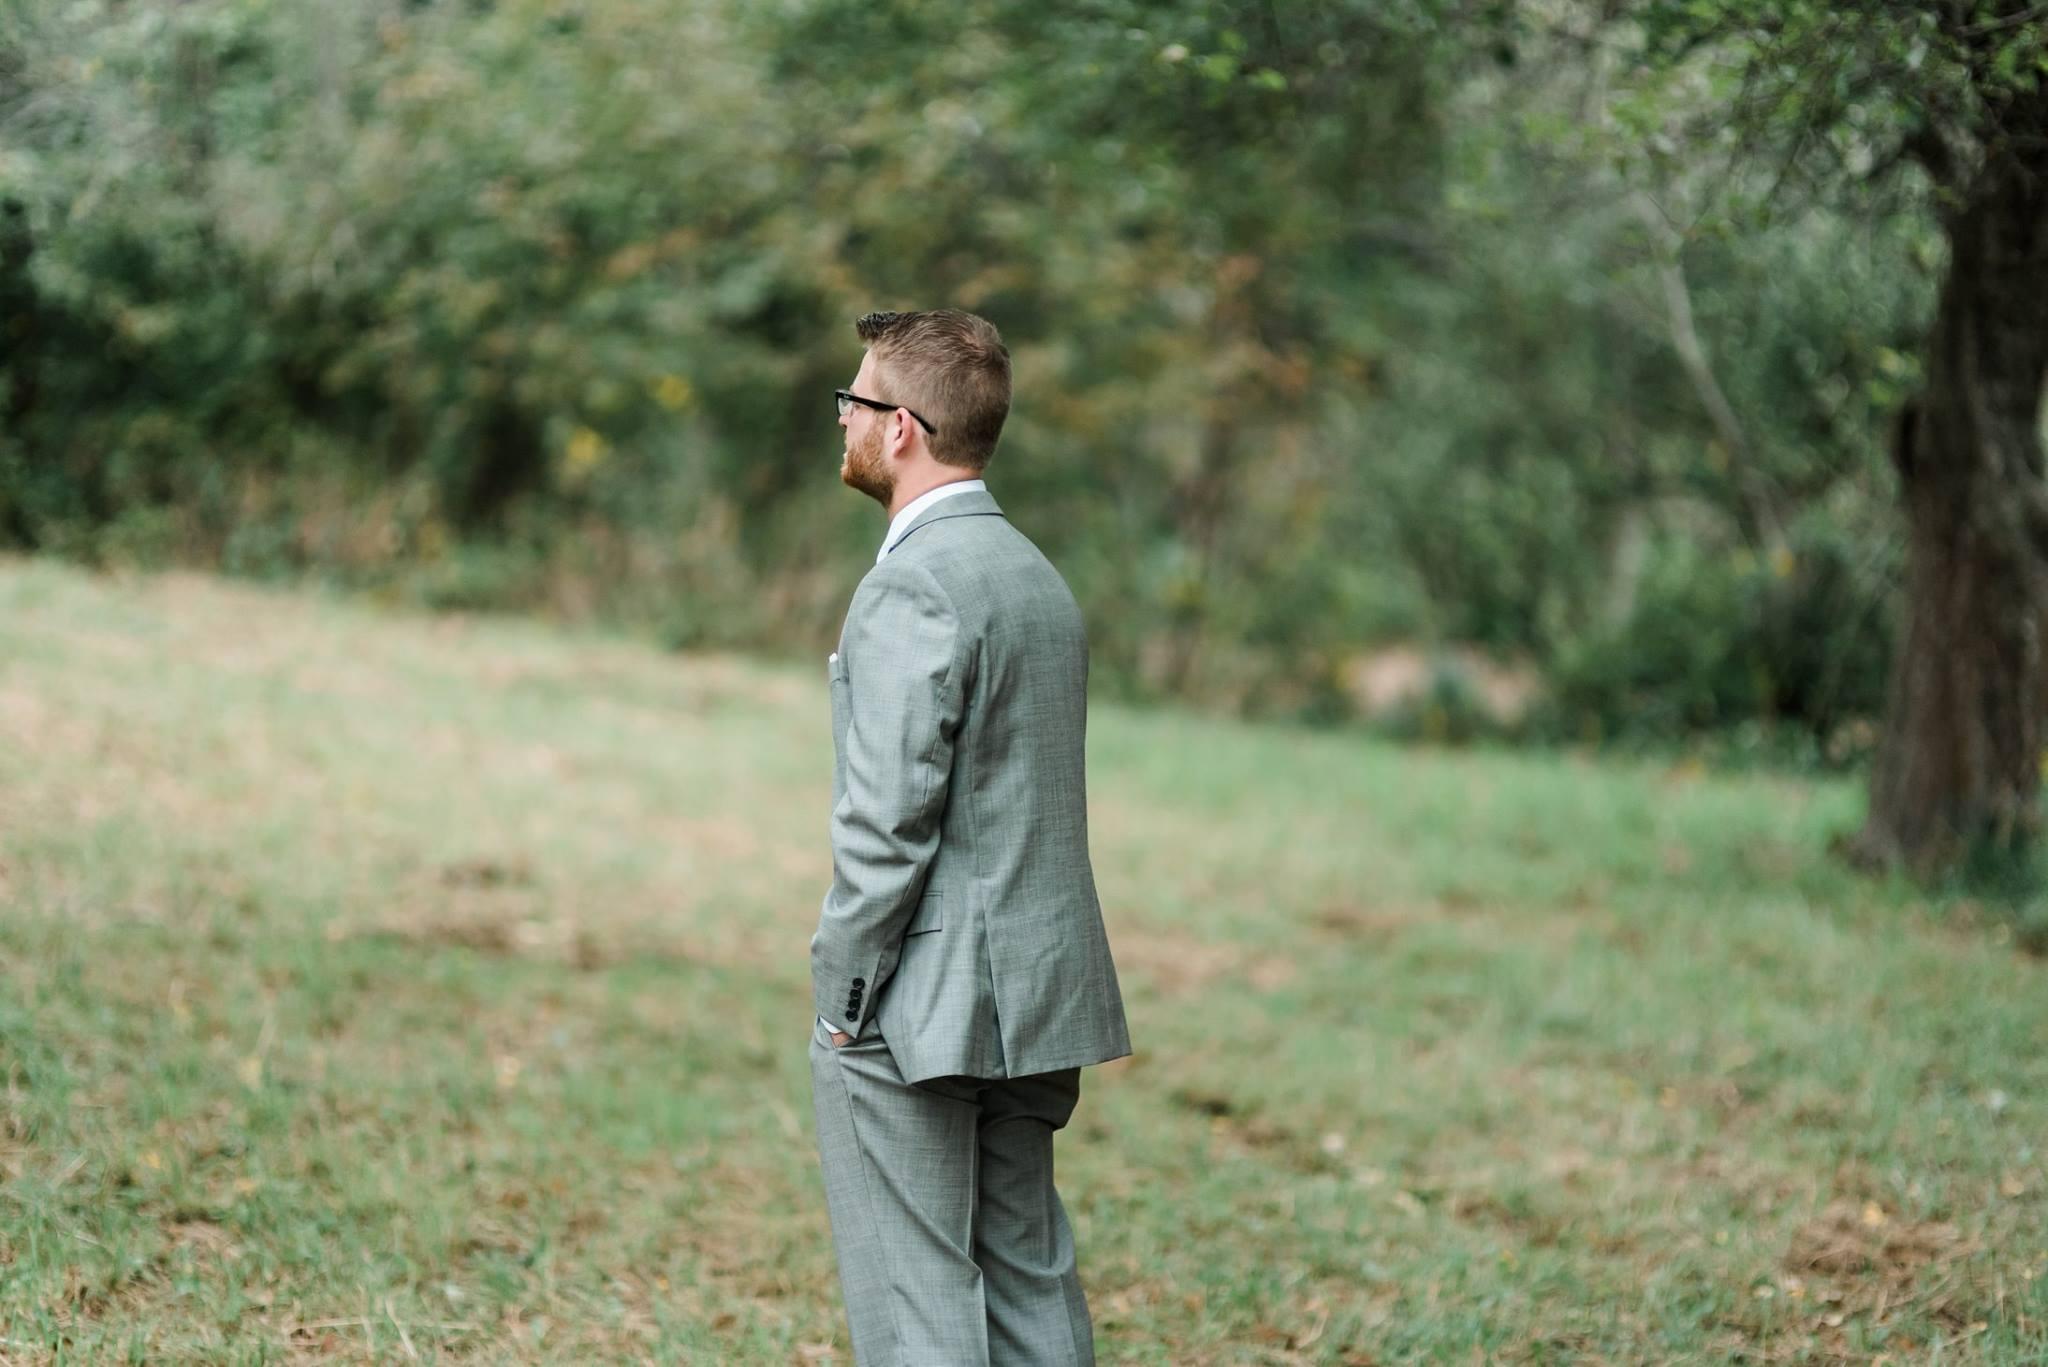 pennsylvania-backyard-wedding-love-diy-bohemian-romantic-colorful-0009.jpg